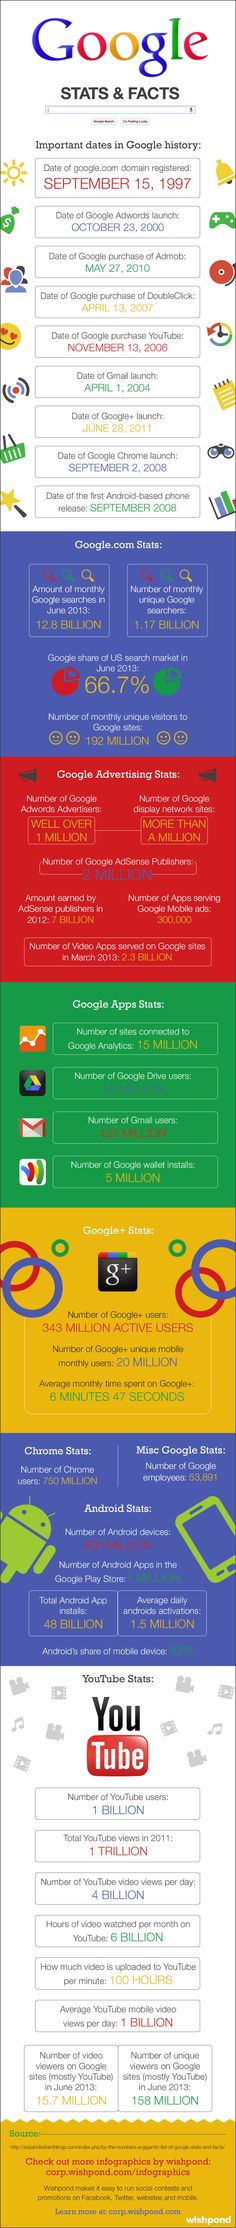 google-it-anatomy-of-a-tech-giant.jpg (900×8500)